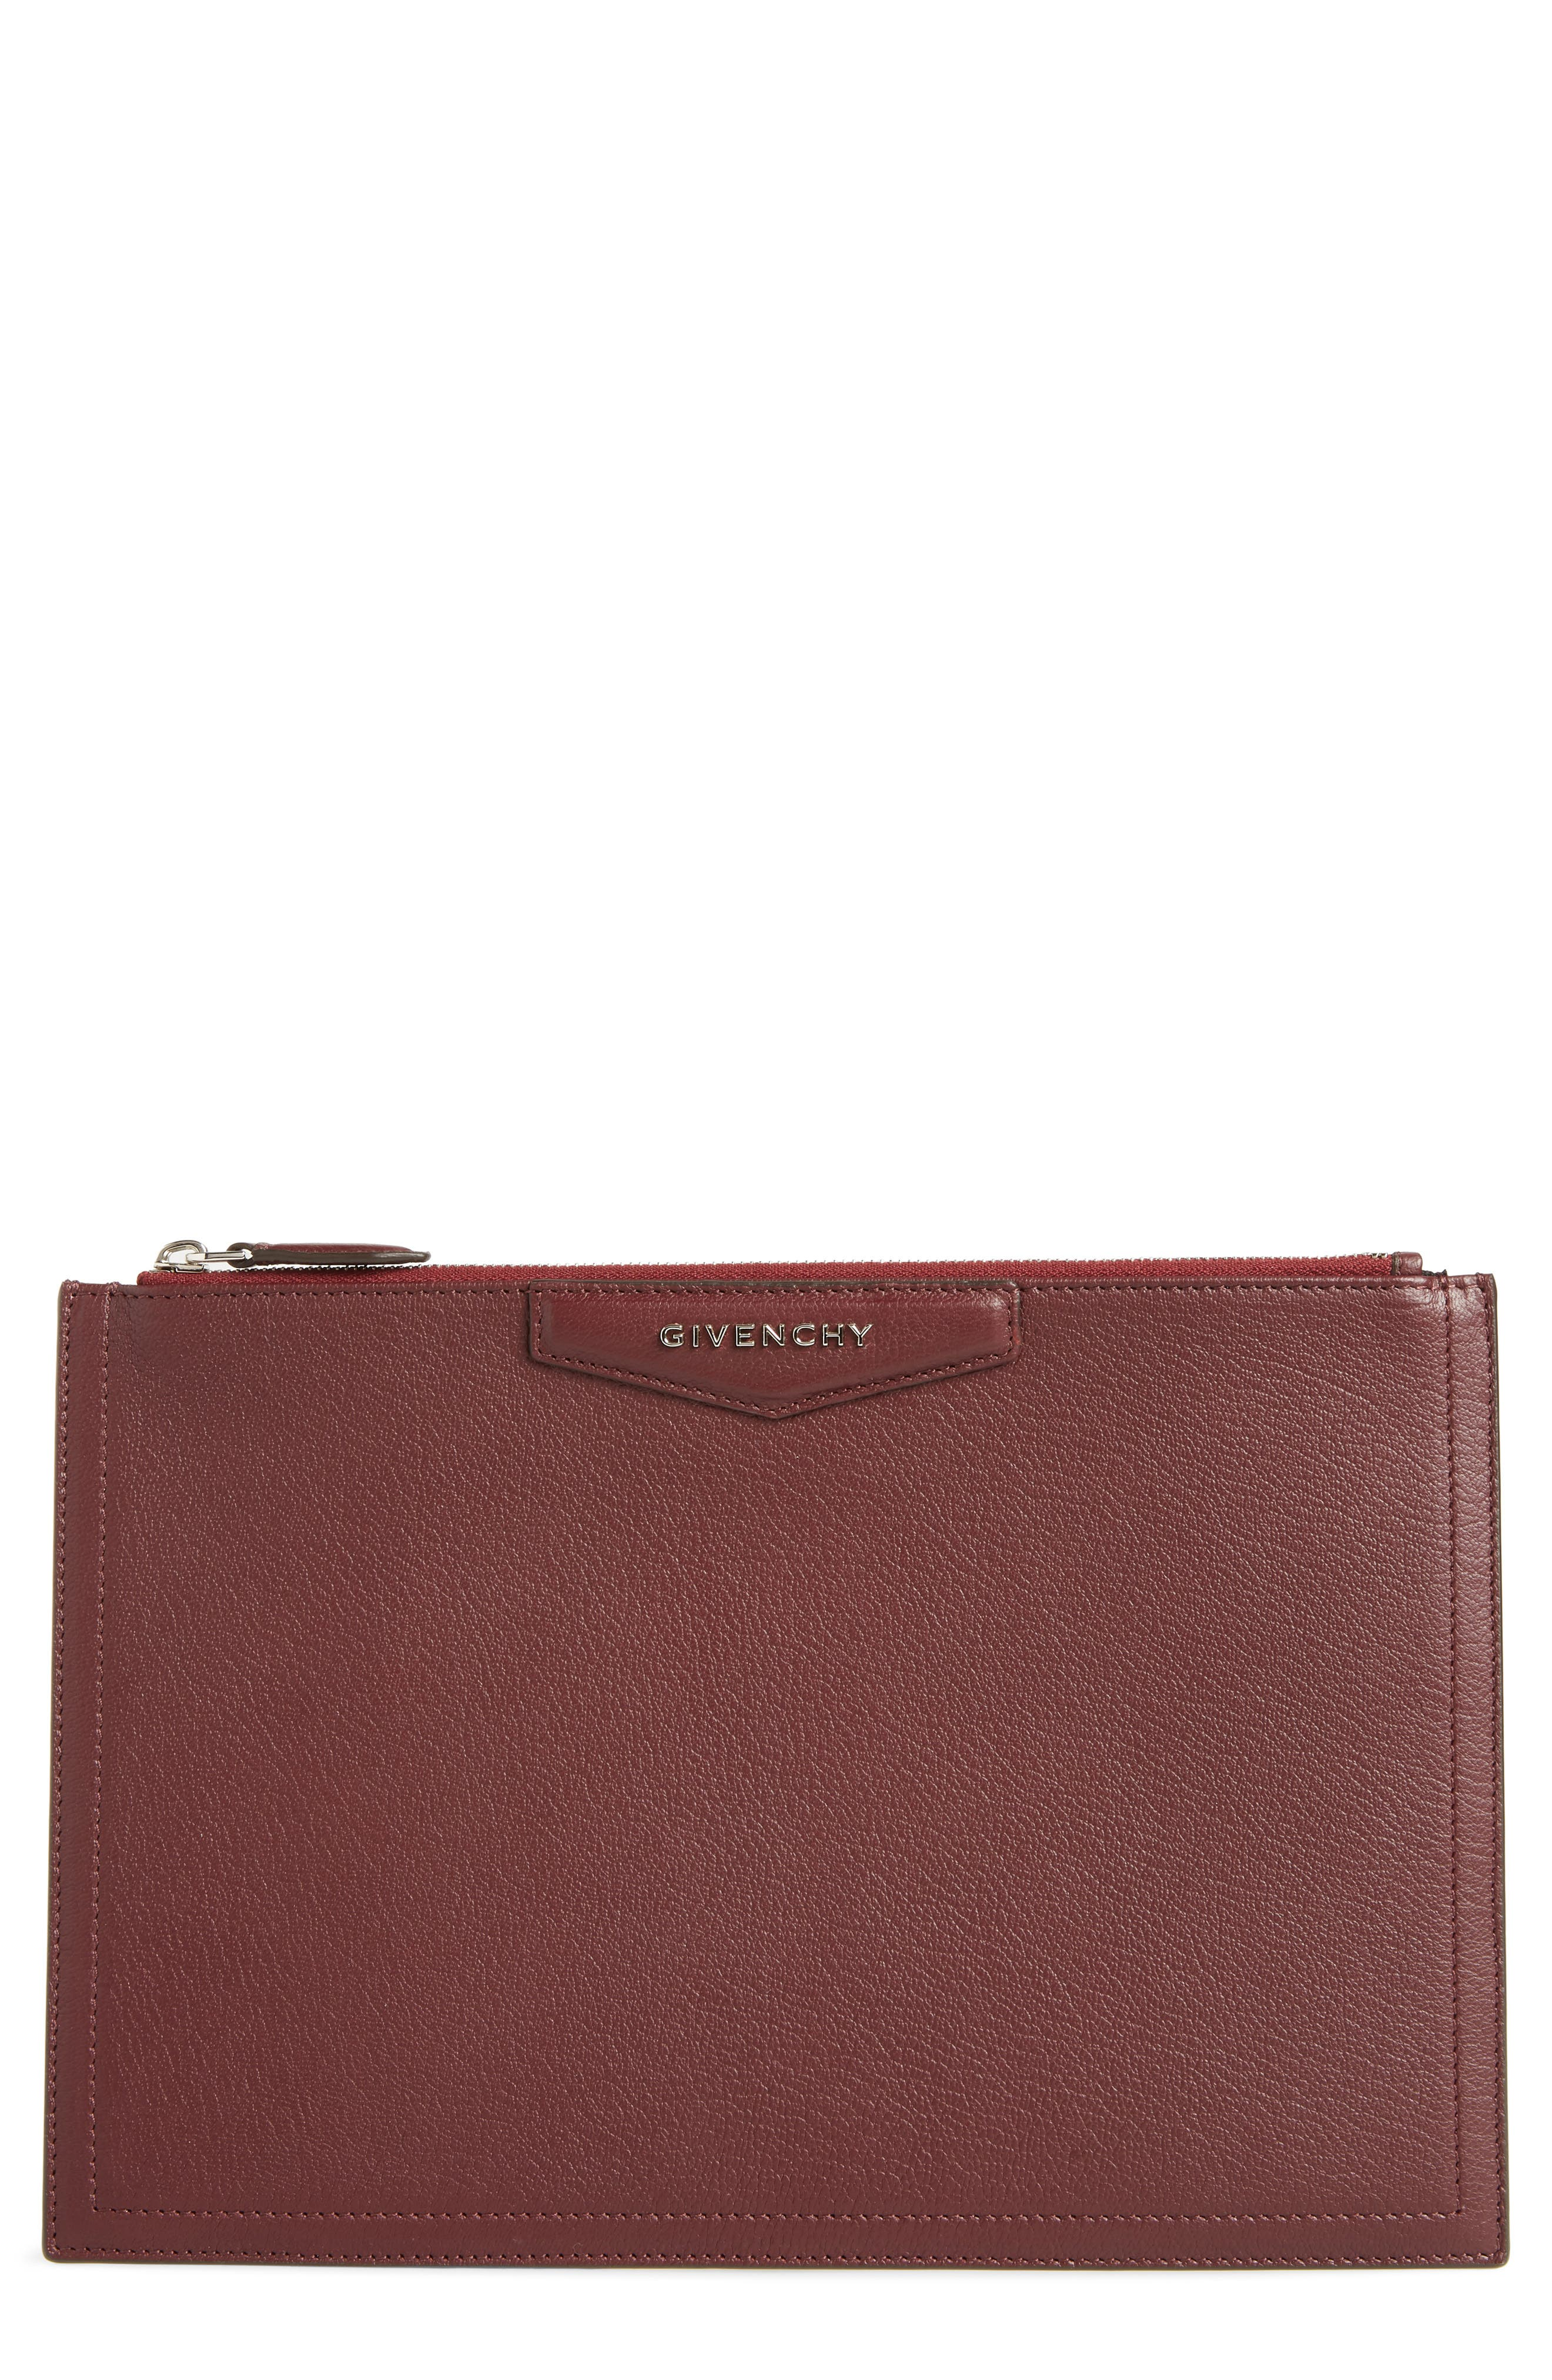 Medium Antigona Leather Pouch,                         Main,                         color, AUBERGINE